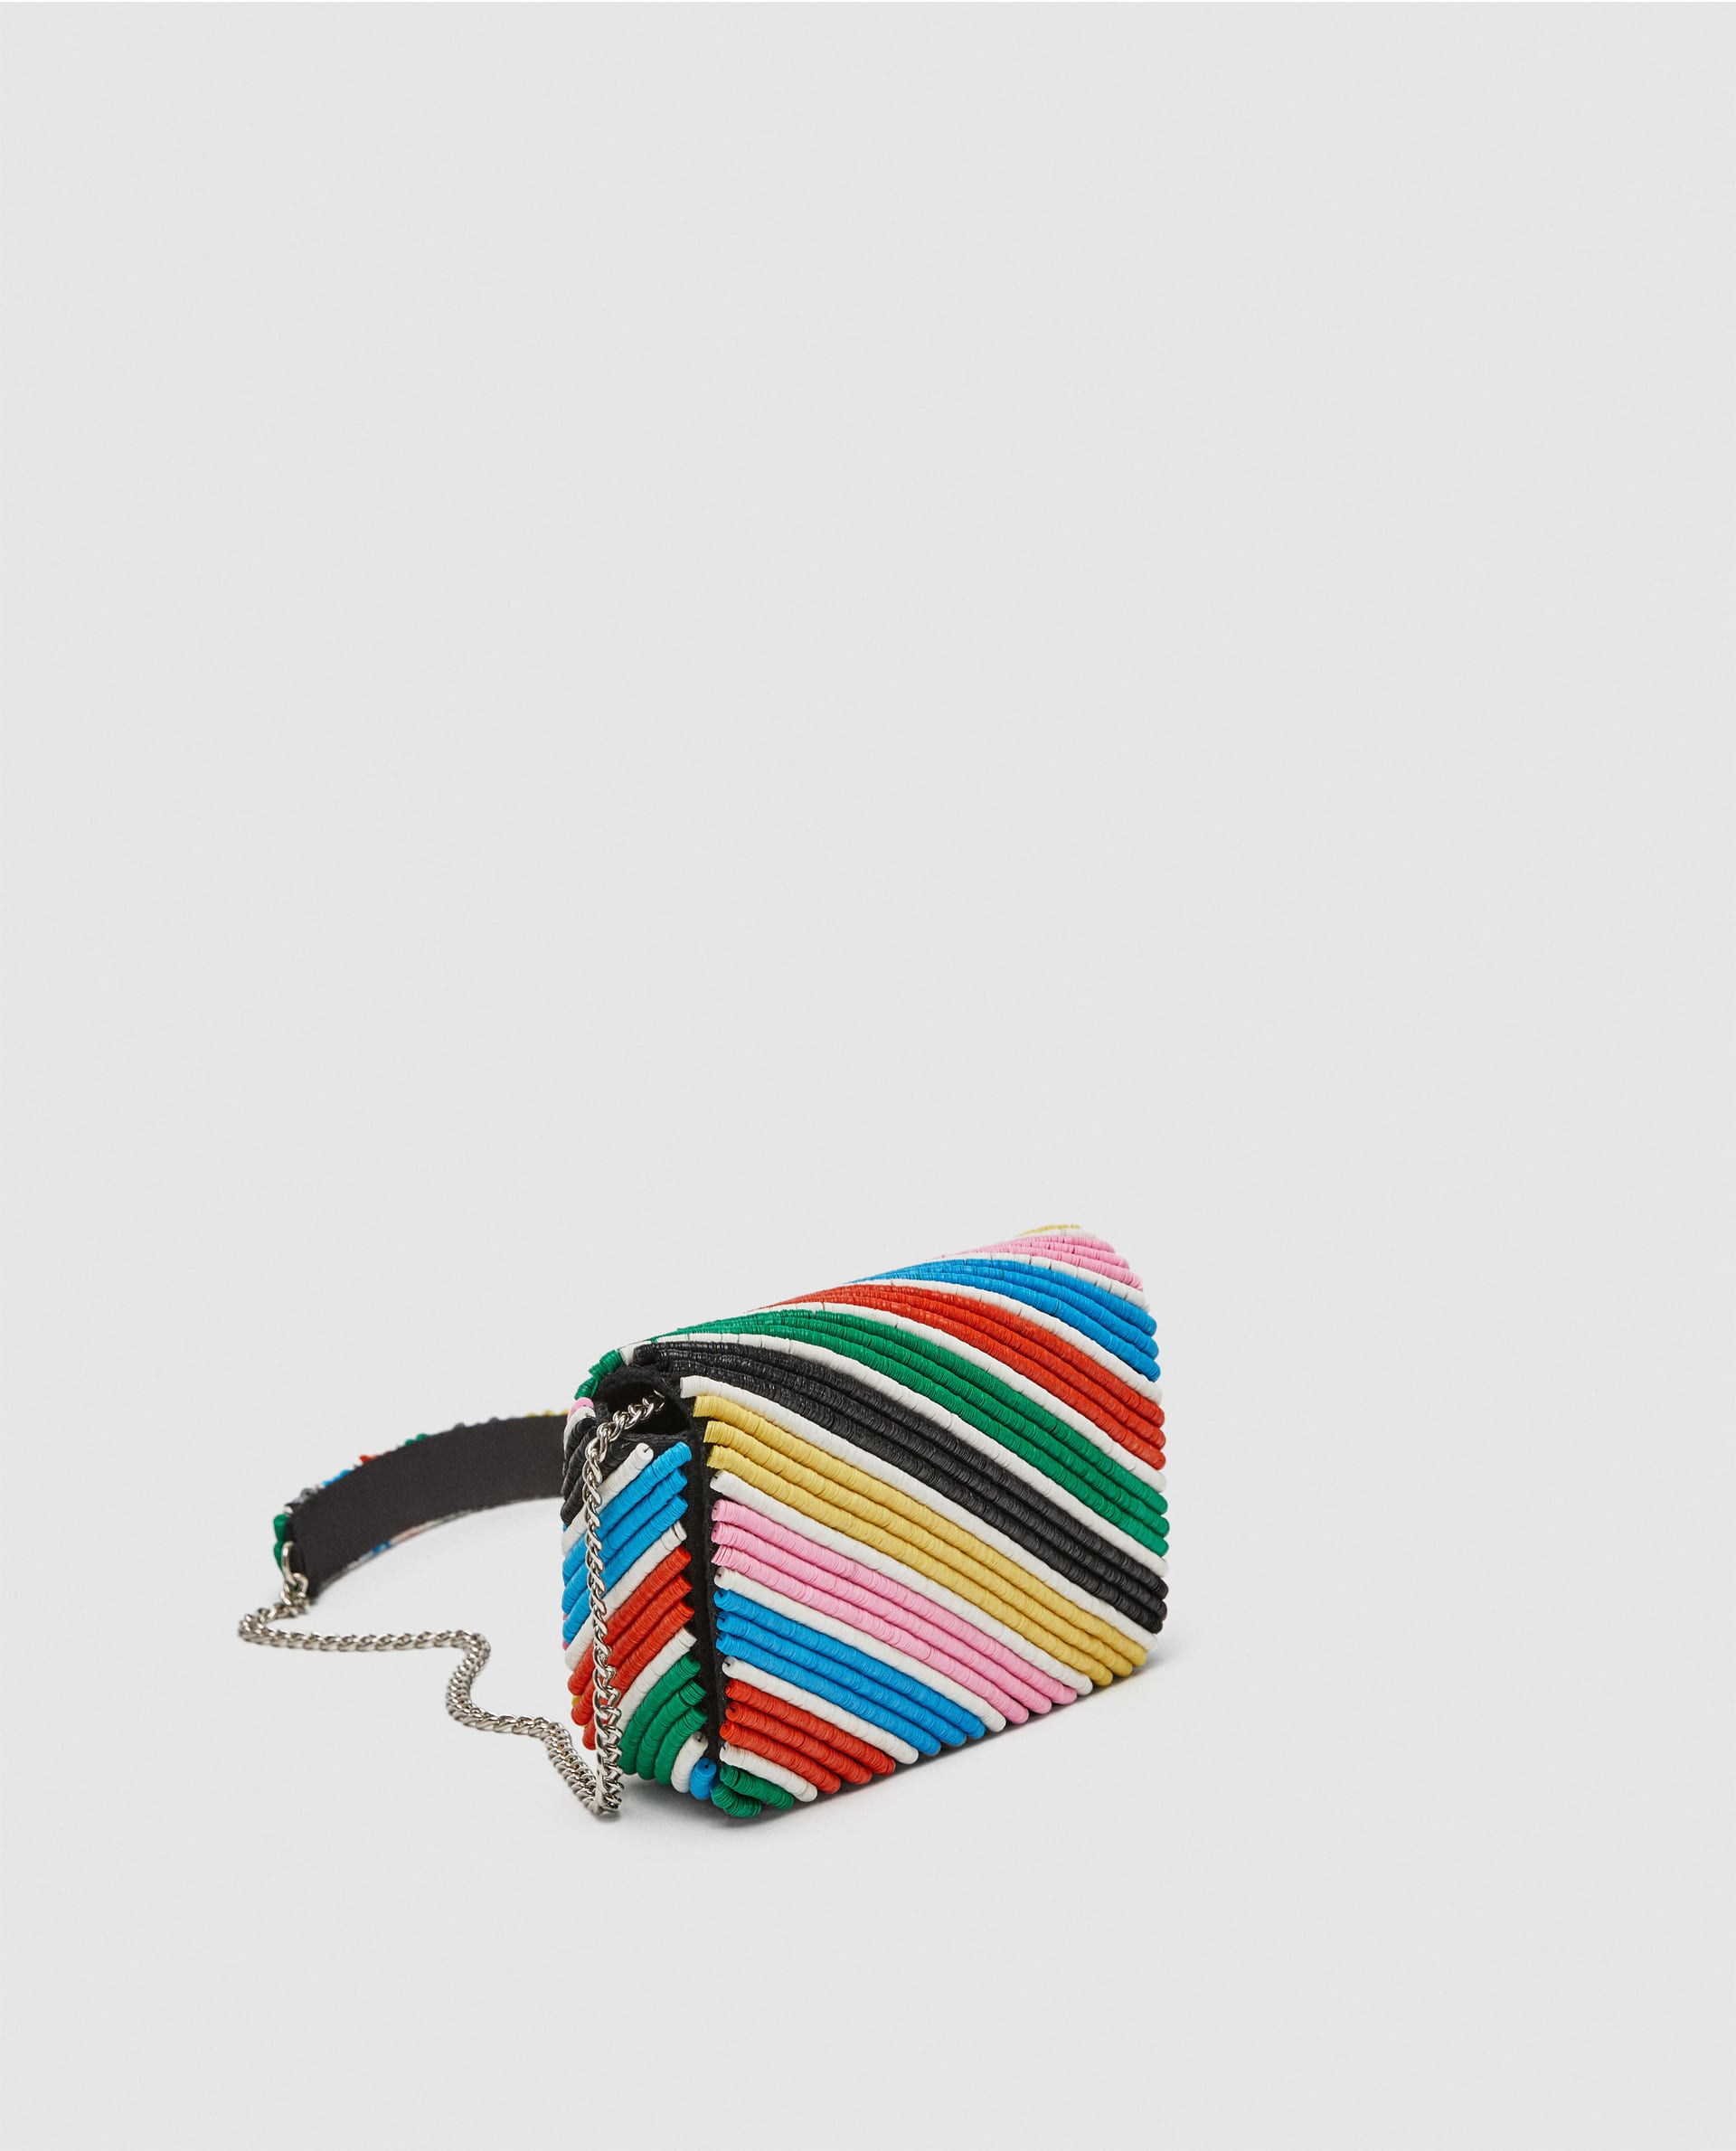 Zara_rainbow bag.jpg